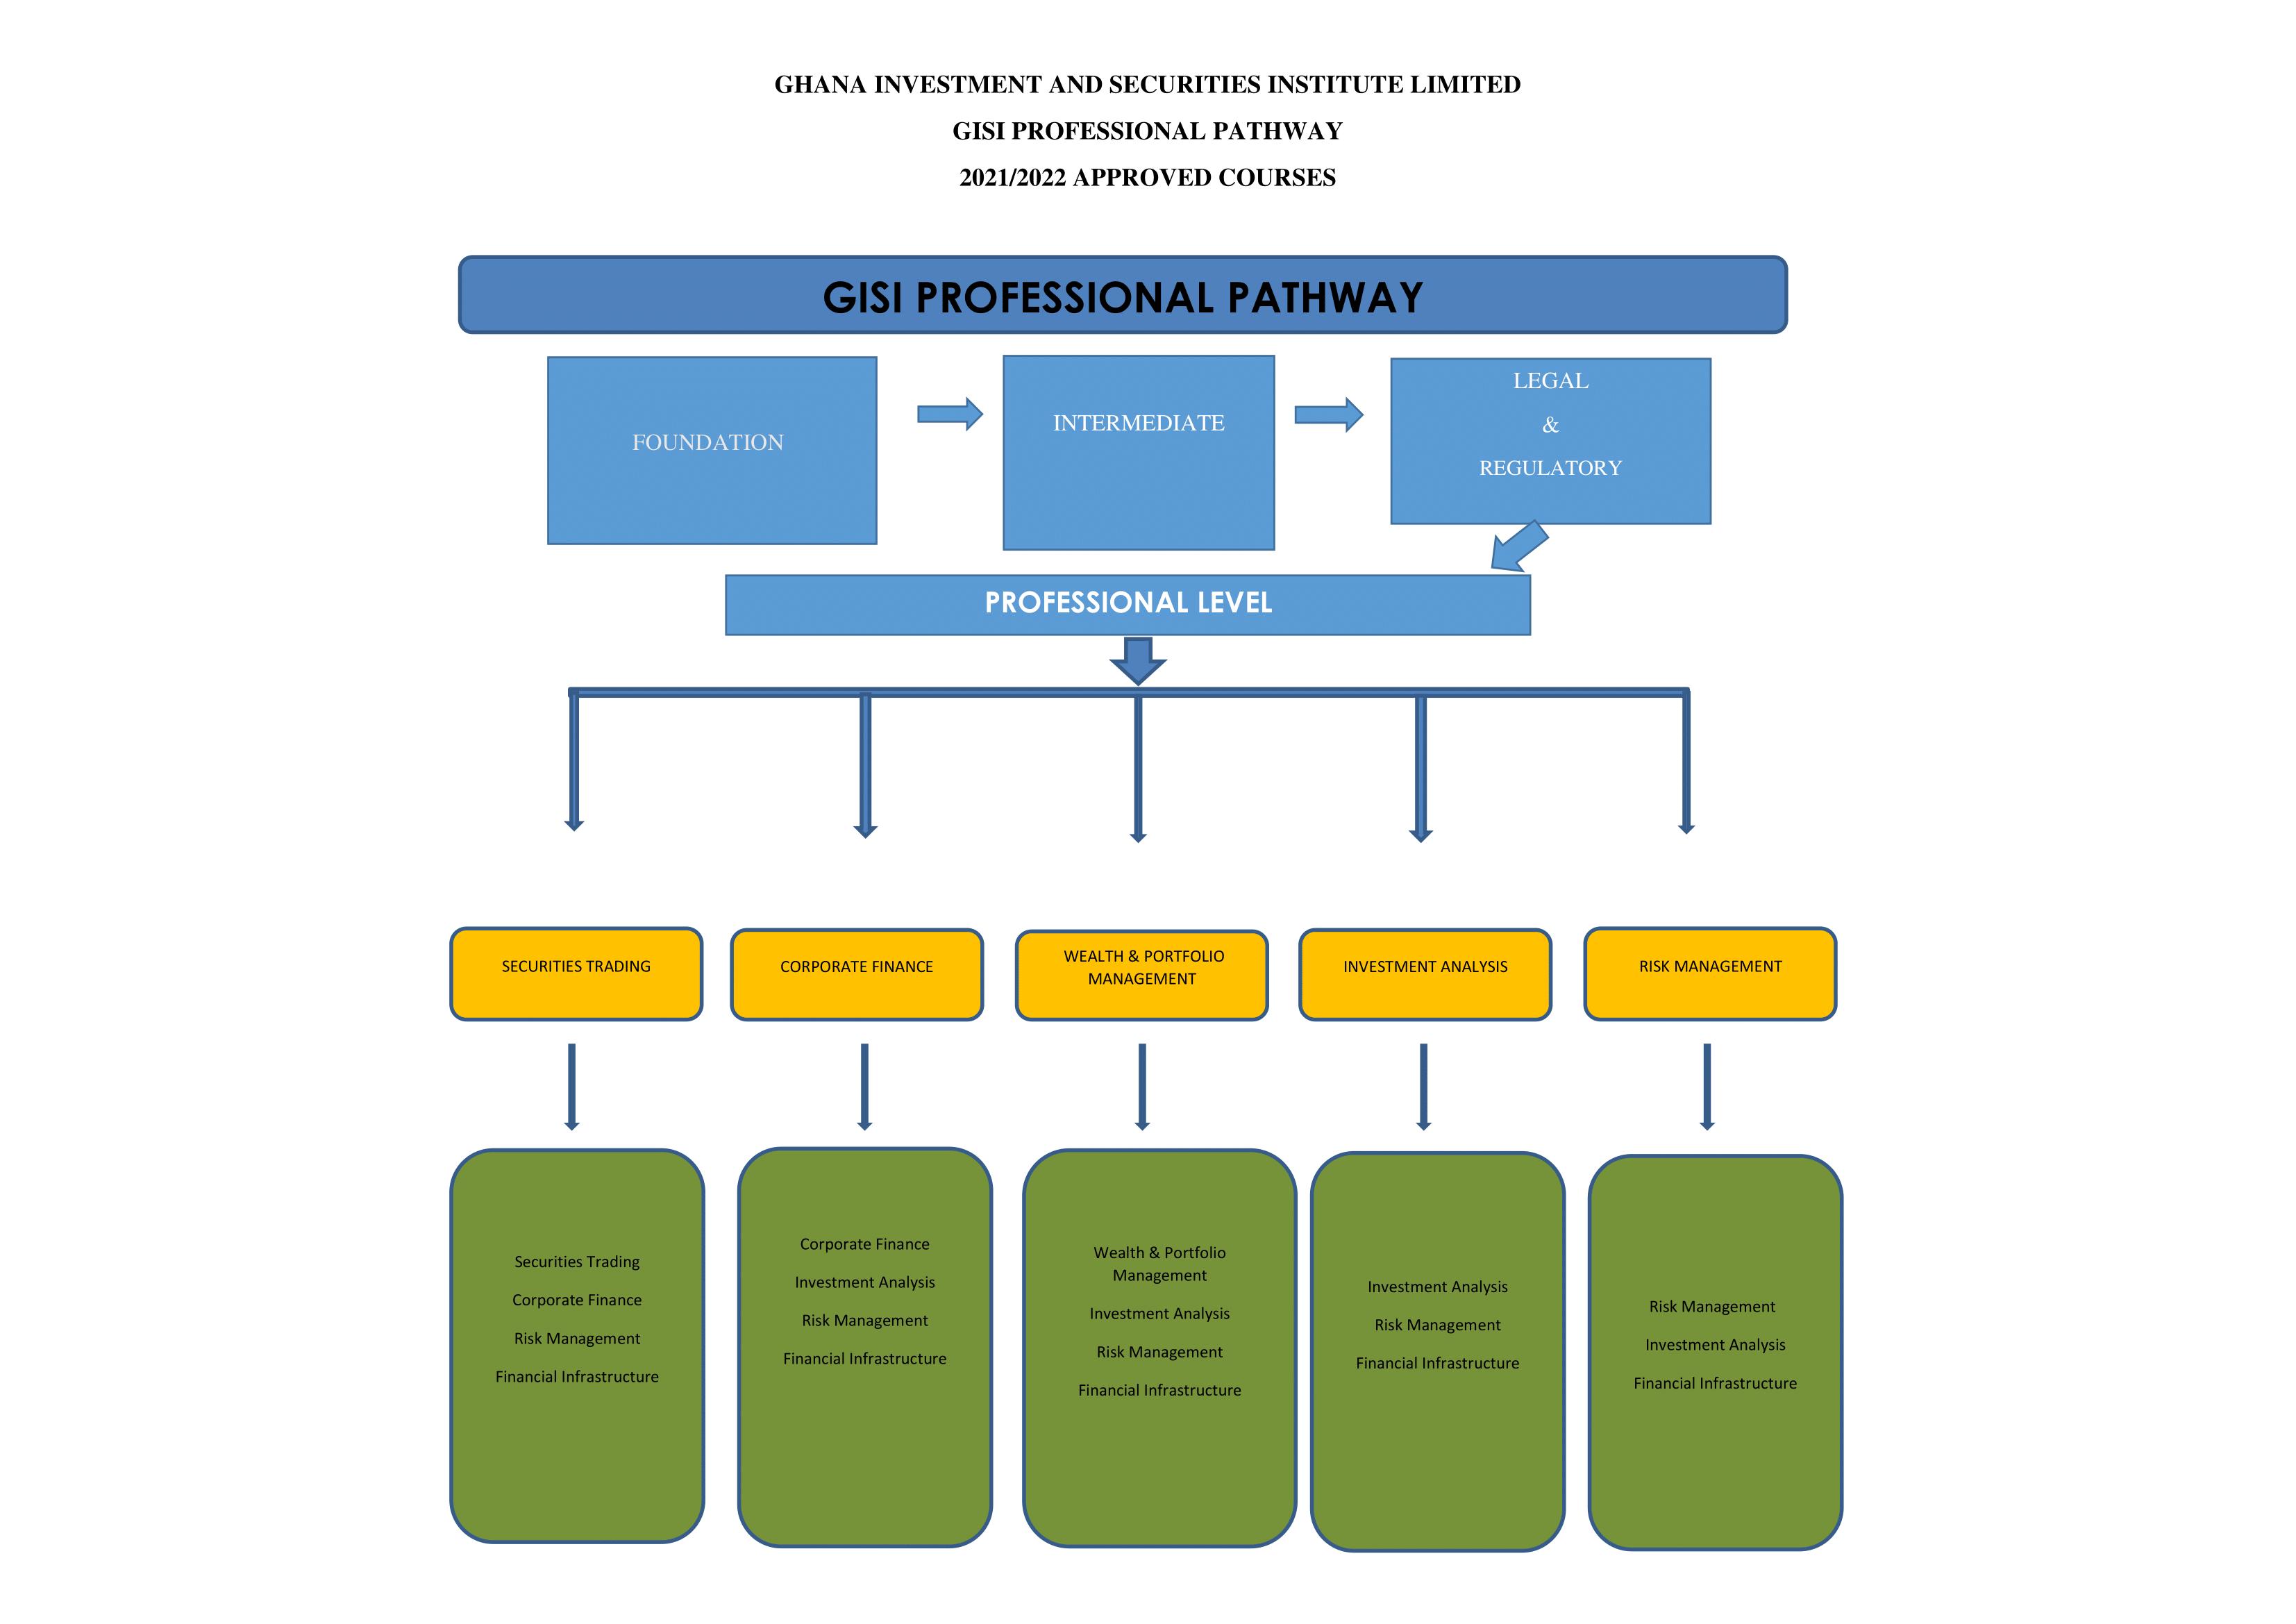 GISI Professional Pathway